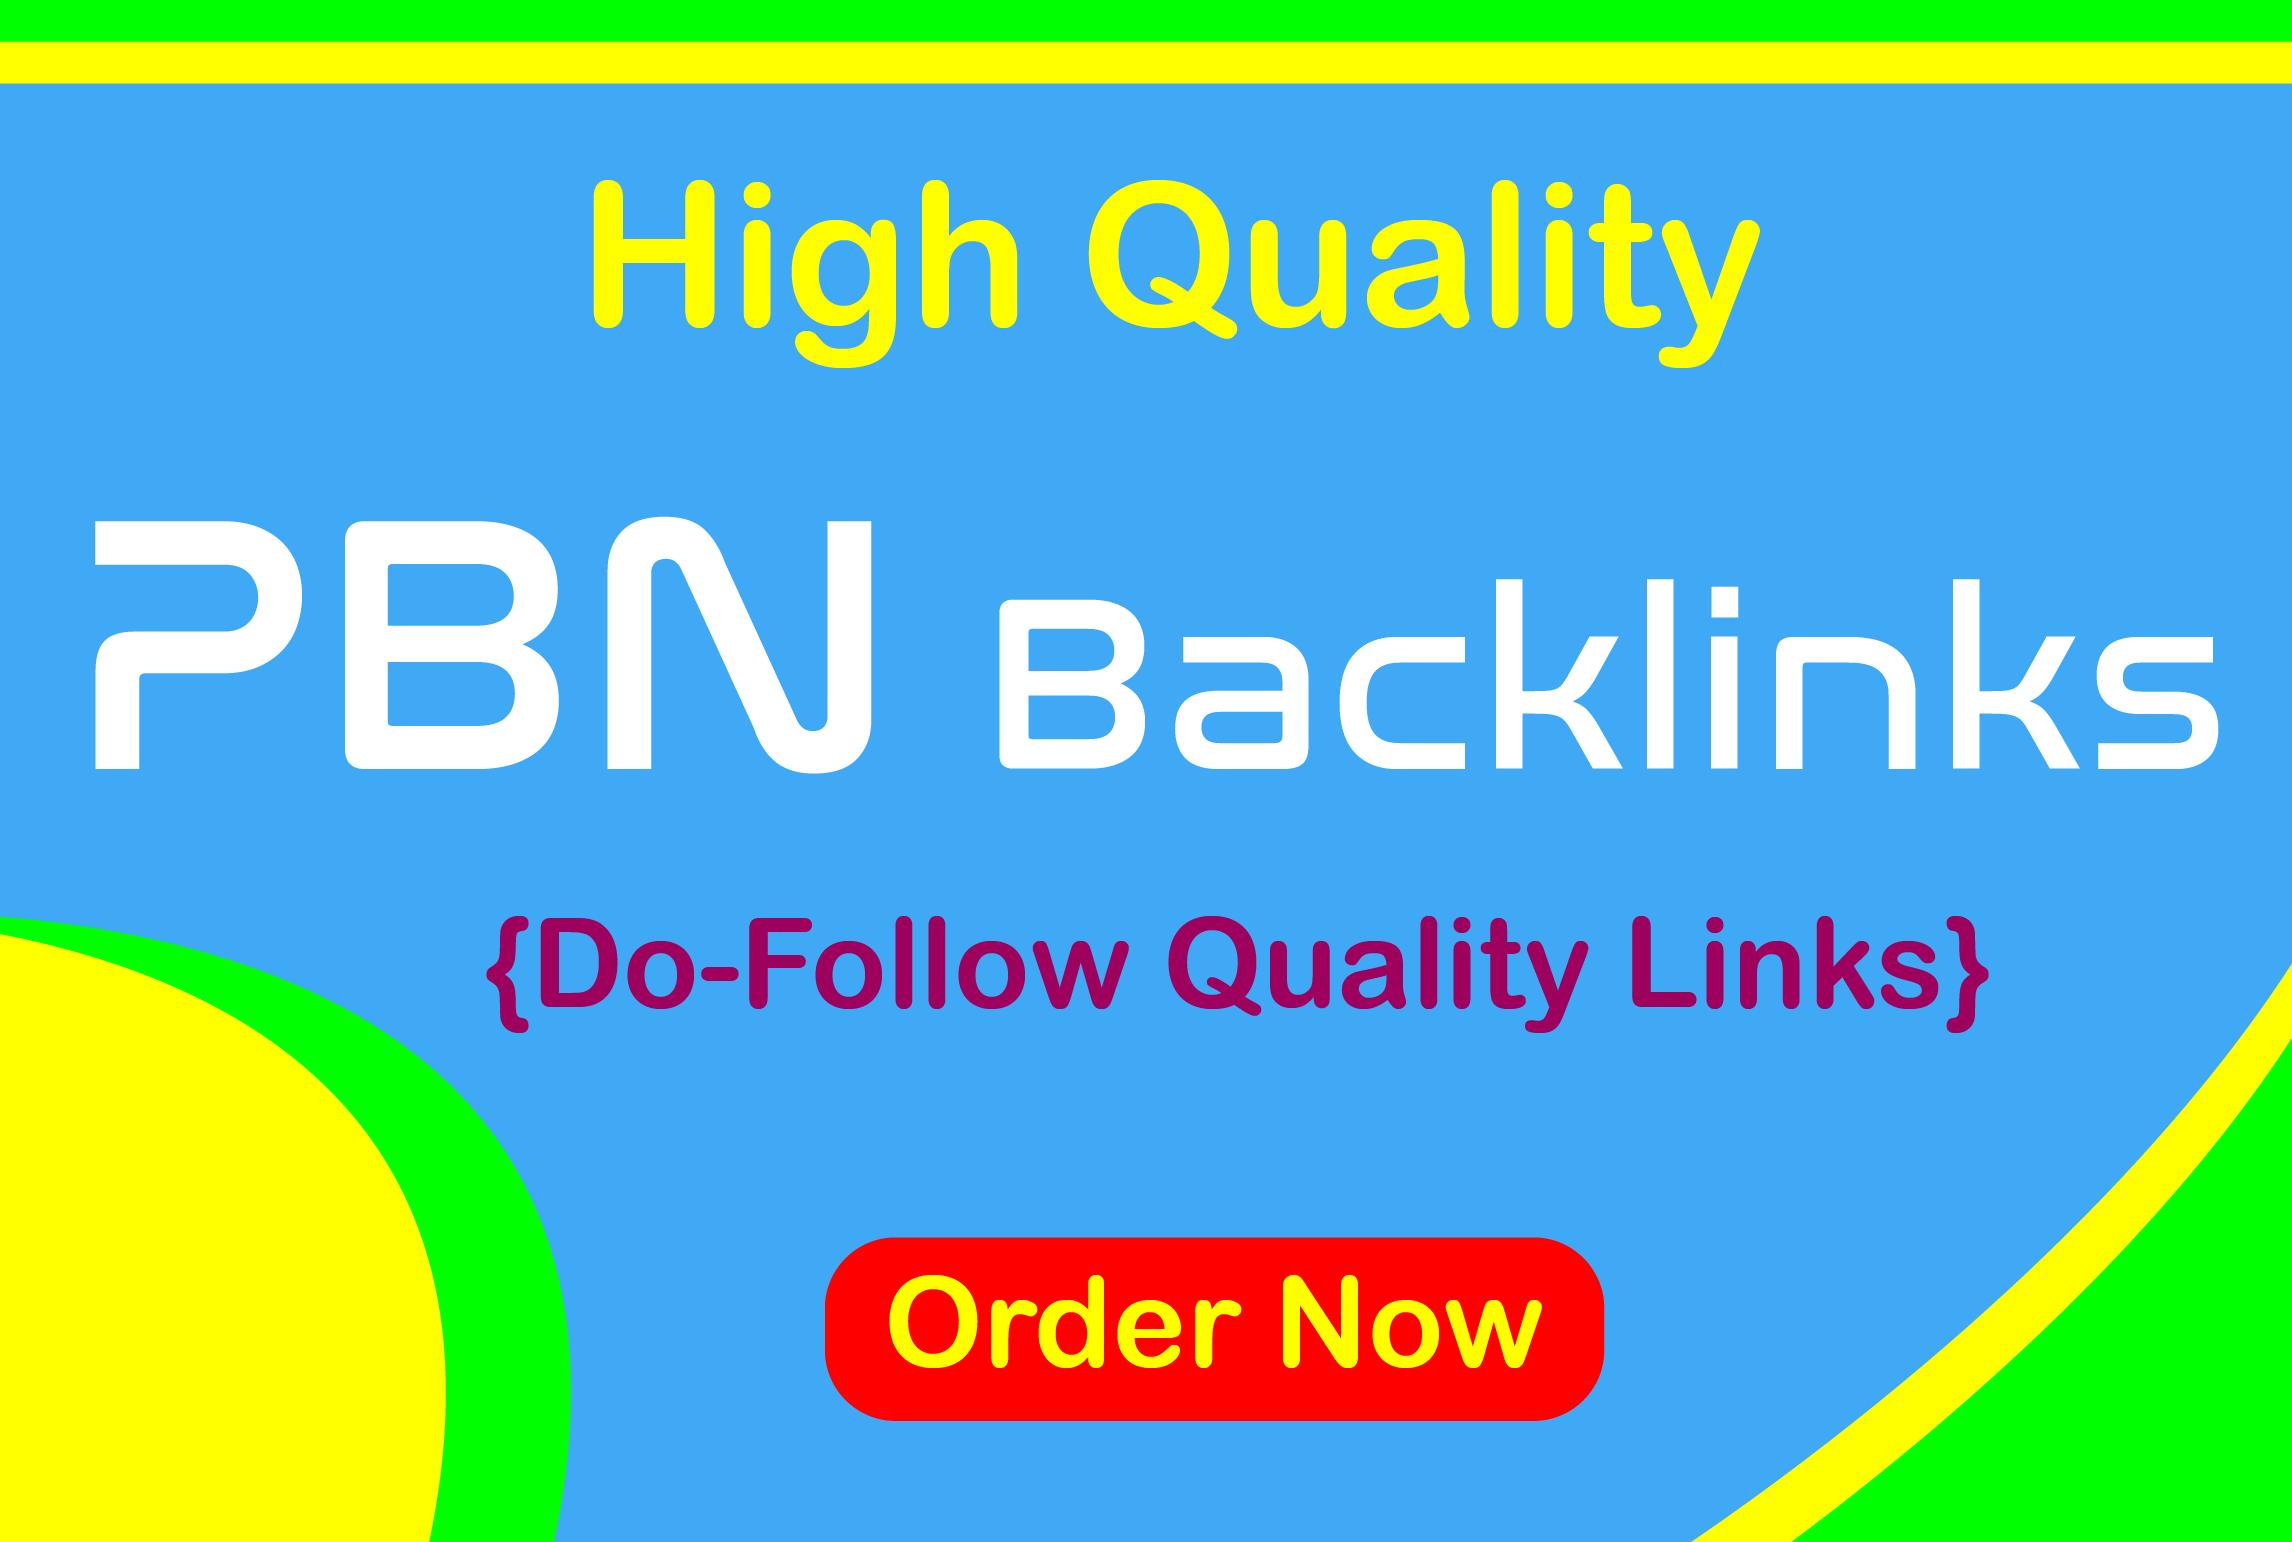 Build 10 High PA DA TF CF MainPage PBN Backlinks - Dofollow Quality Links